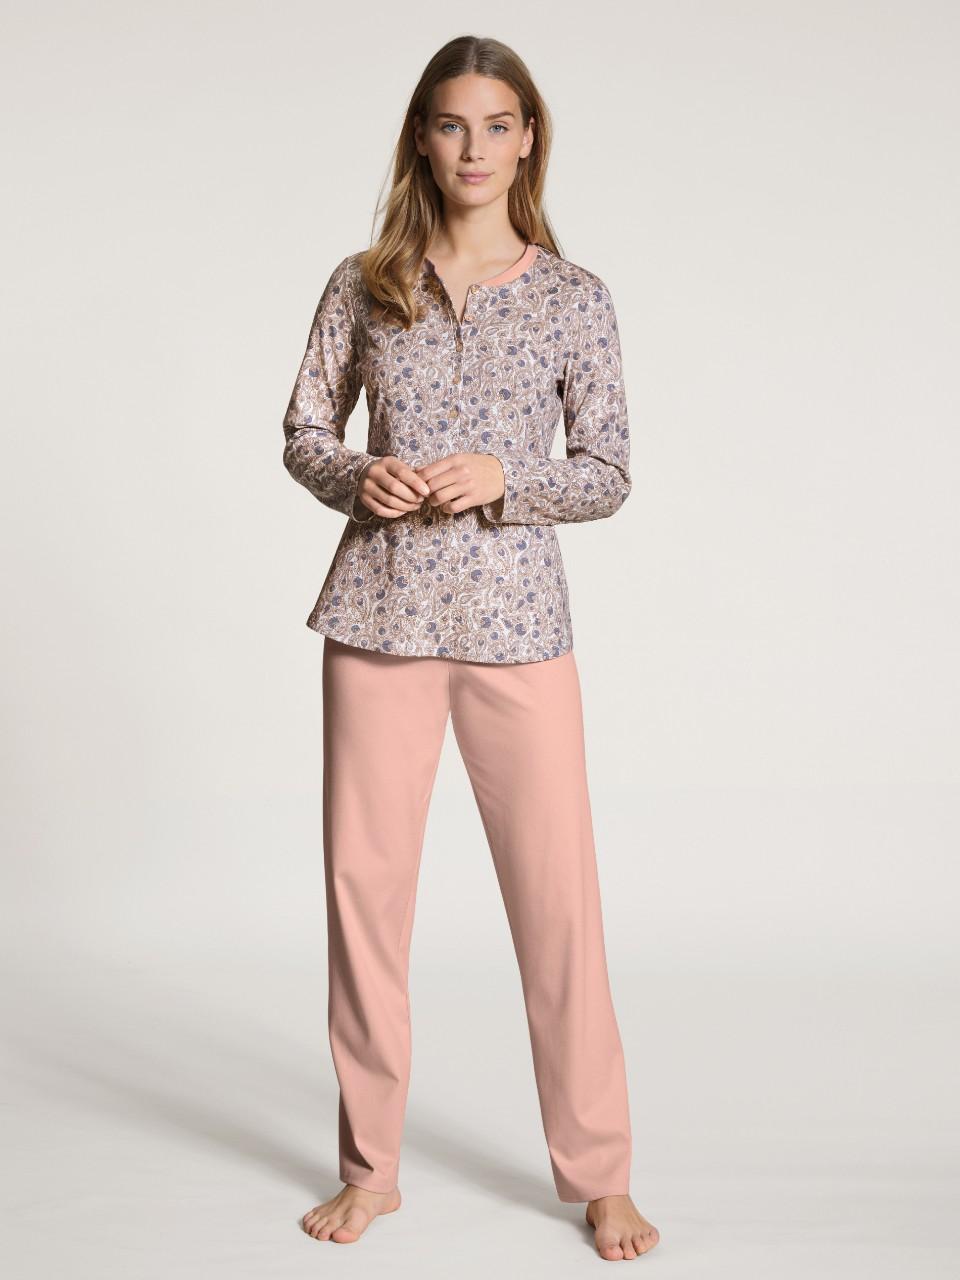 Calida pyjamas Midnight Flower 46624 / 101